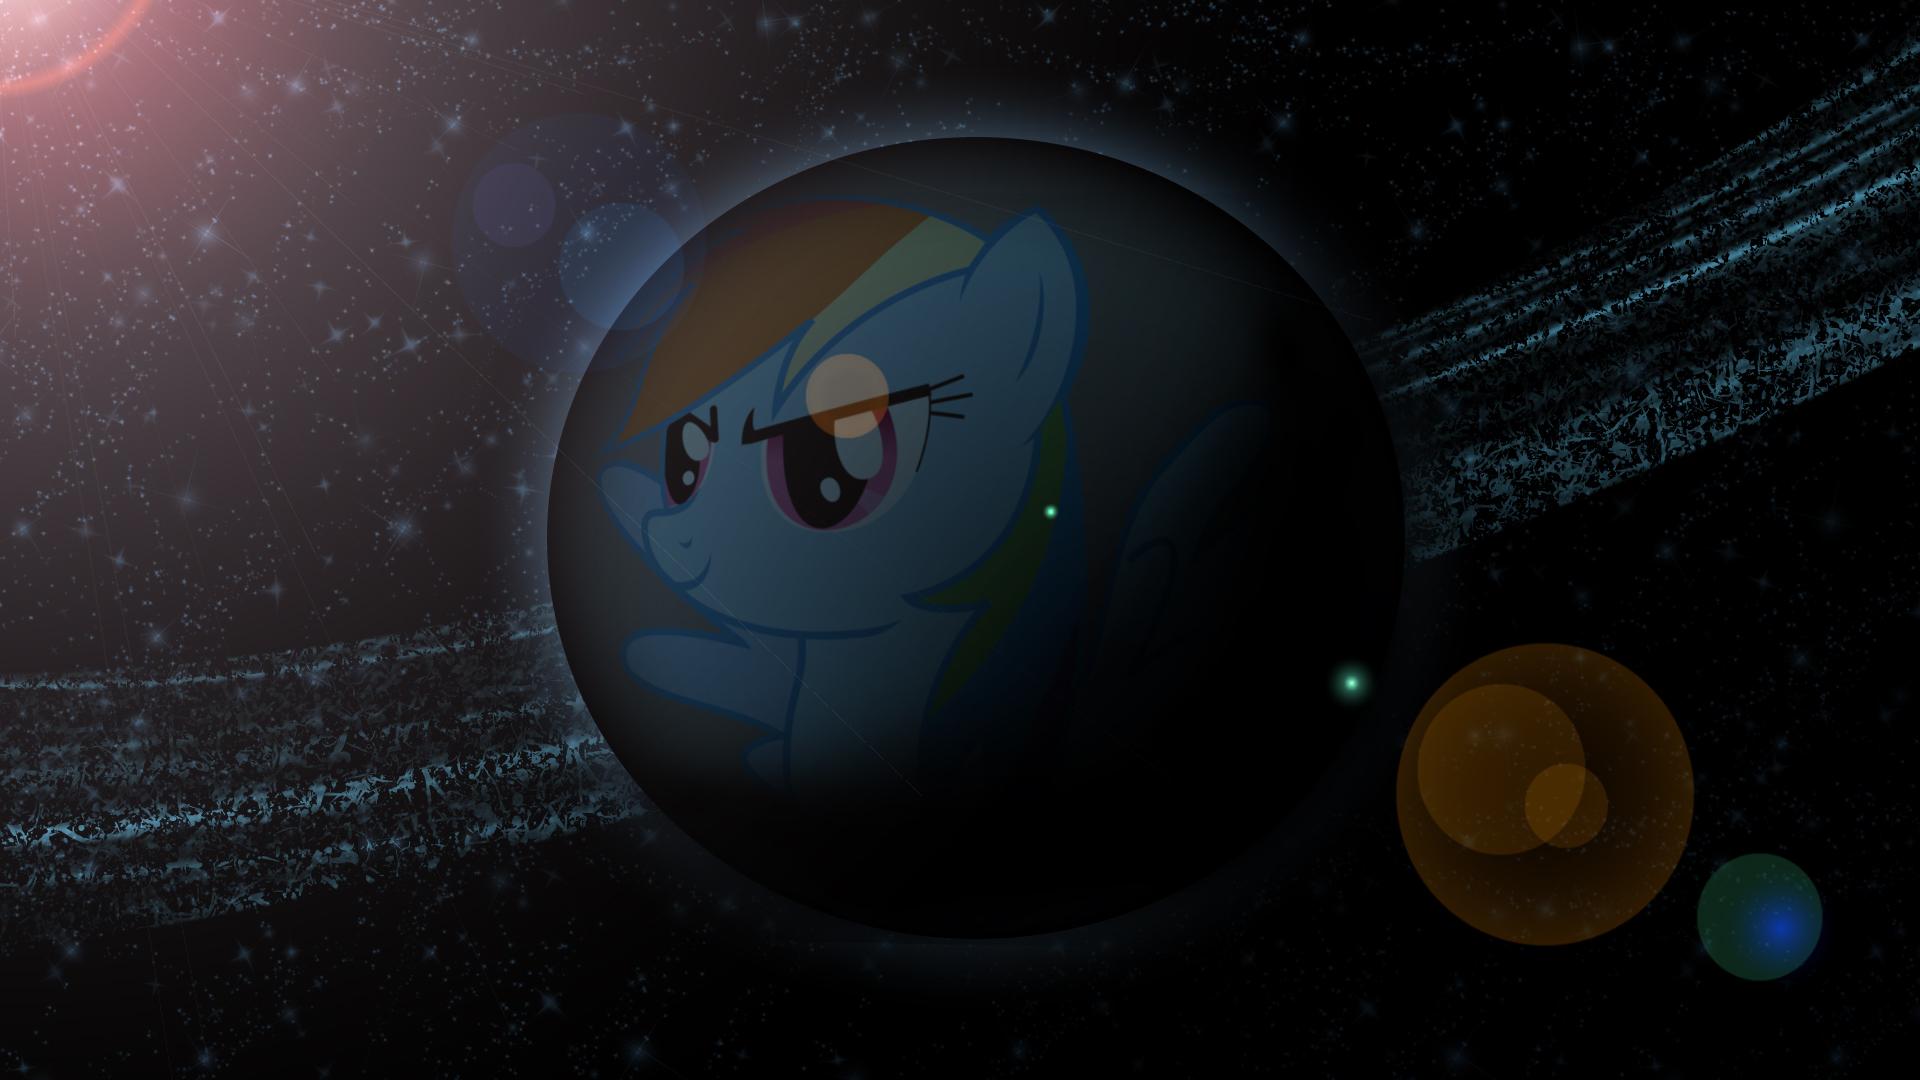 Planet Rainbow Dash by Hardii